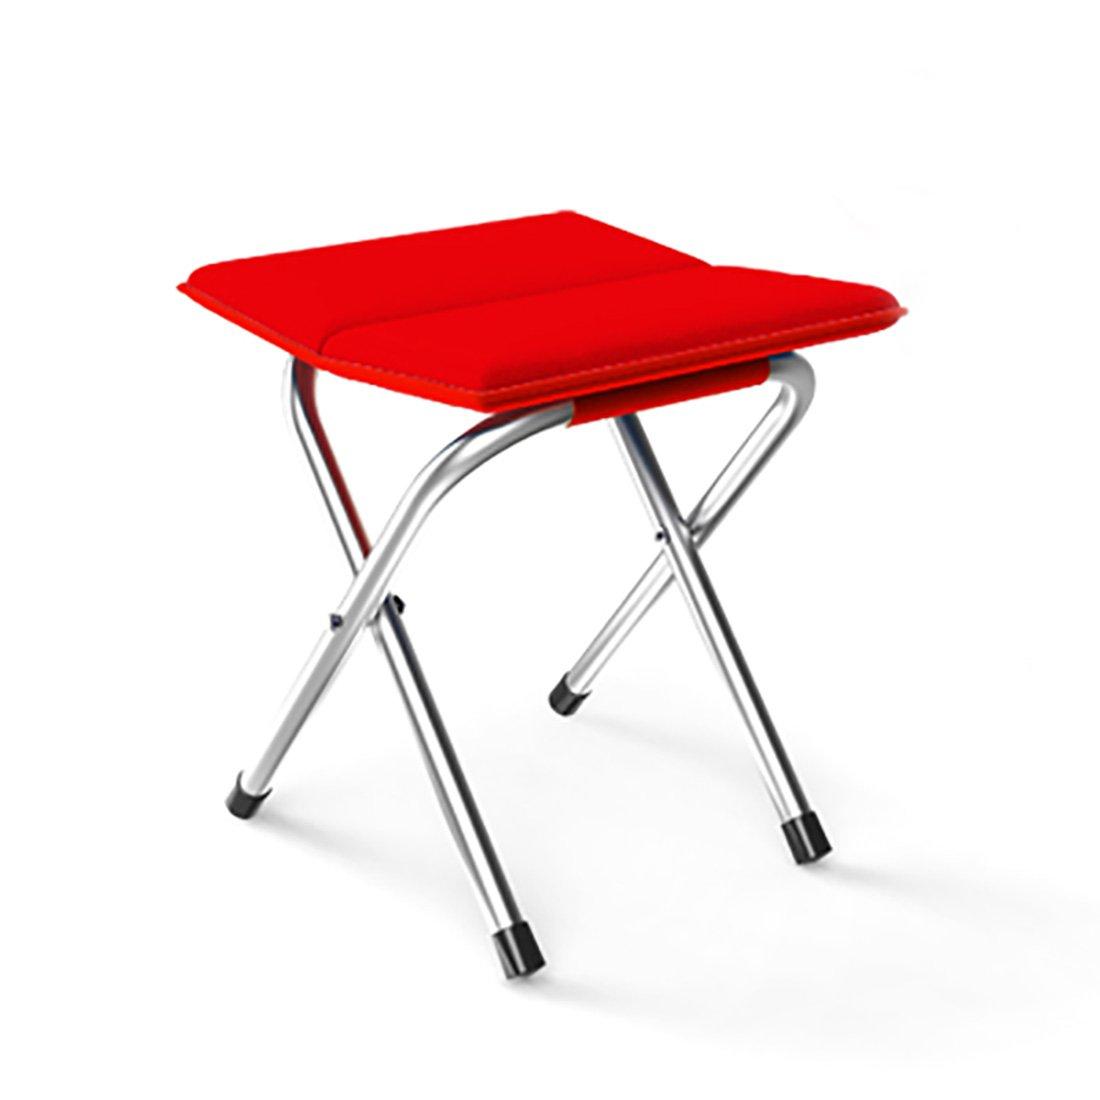 sannixミニポータブル折りたたみスツールアウトドアFolding Stool forキャンプ釣り旅行ハイキングGardenビーチquickly-fold椅子オックスフォード布 B071KKC1CB レッド レッド